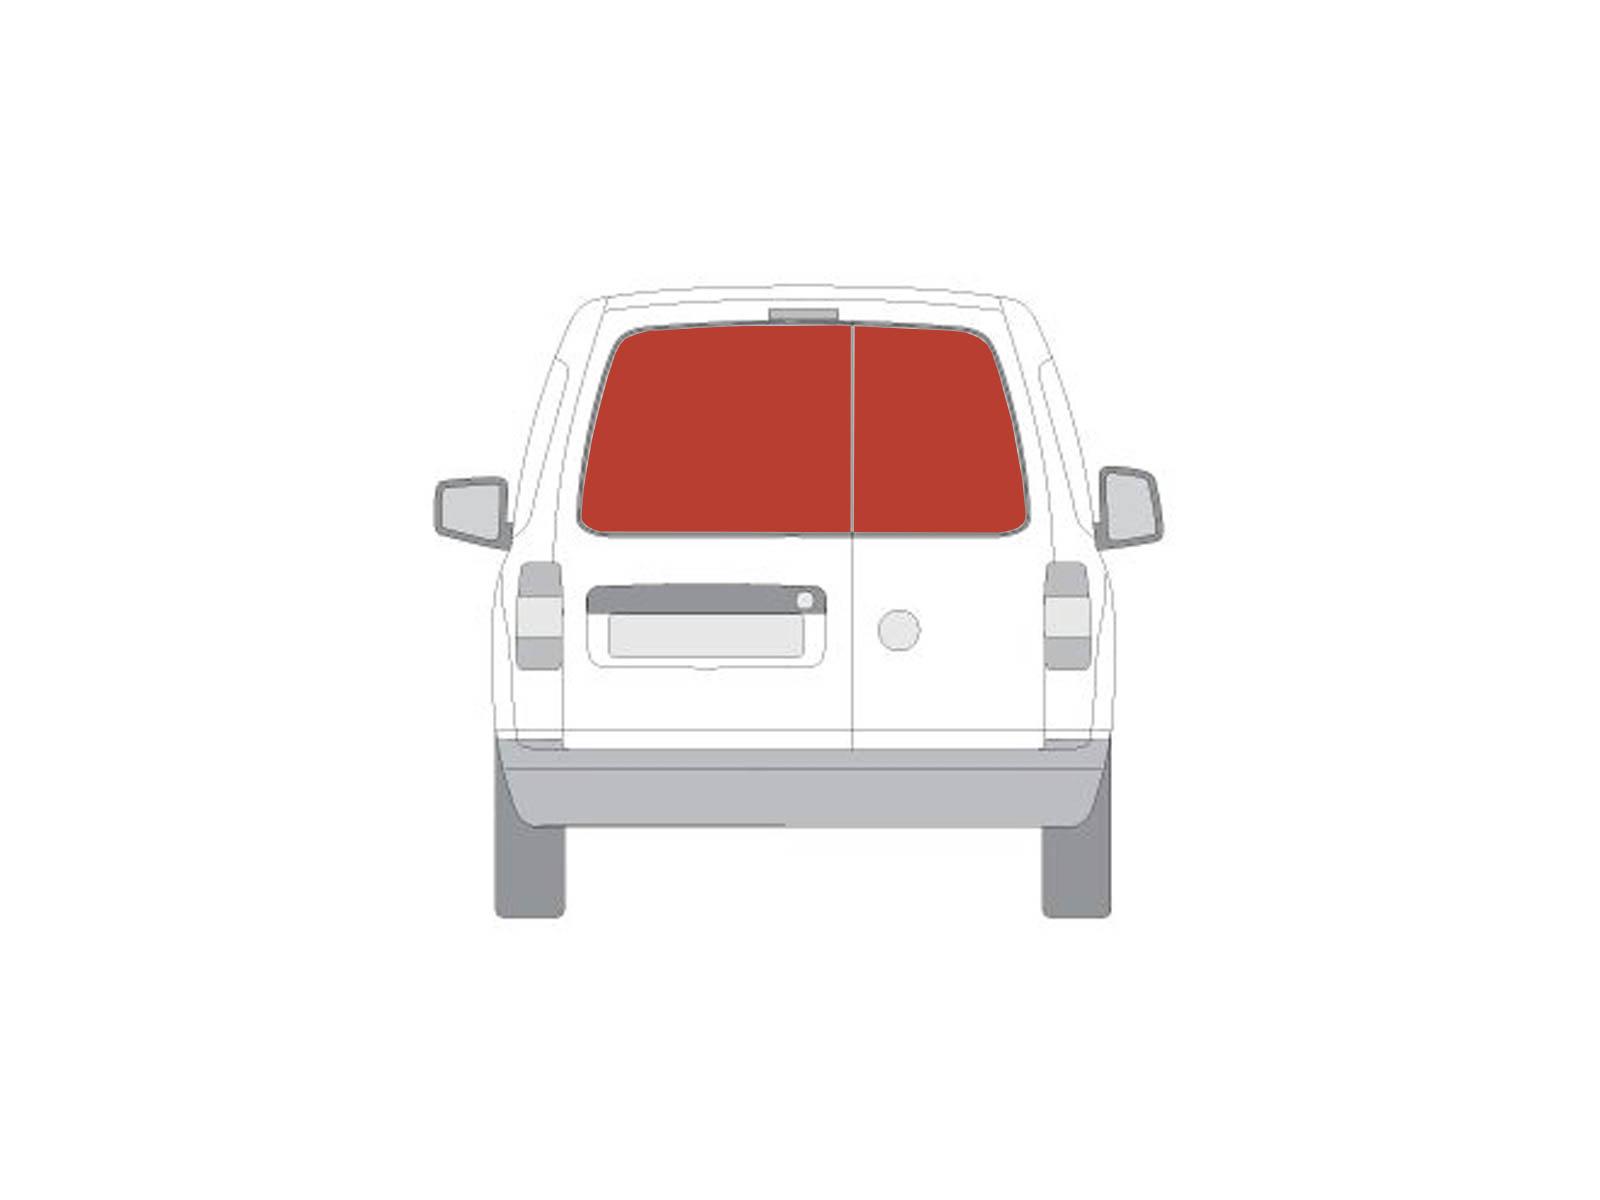 Sentinel Rear Barn Door Dark Tint Windows Pair Van Conversion Glass For VW Caddy 04